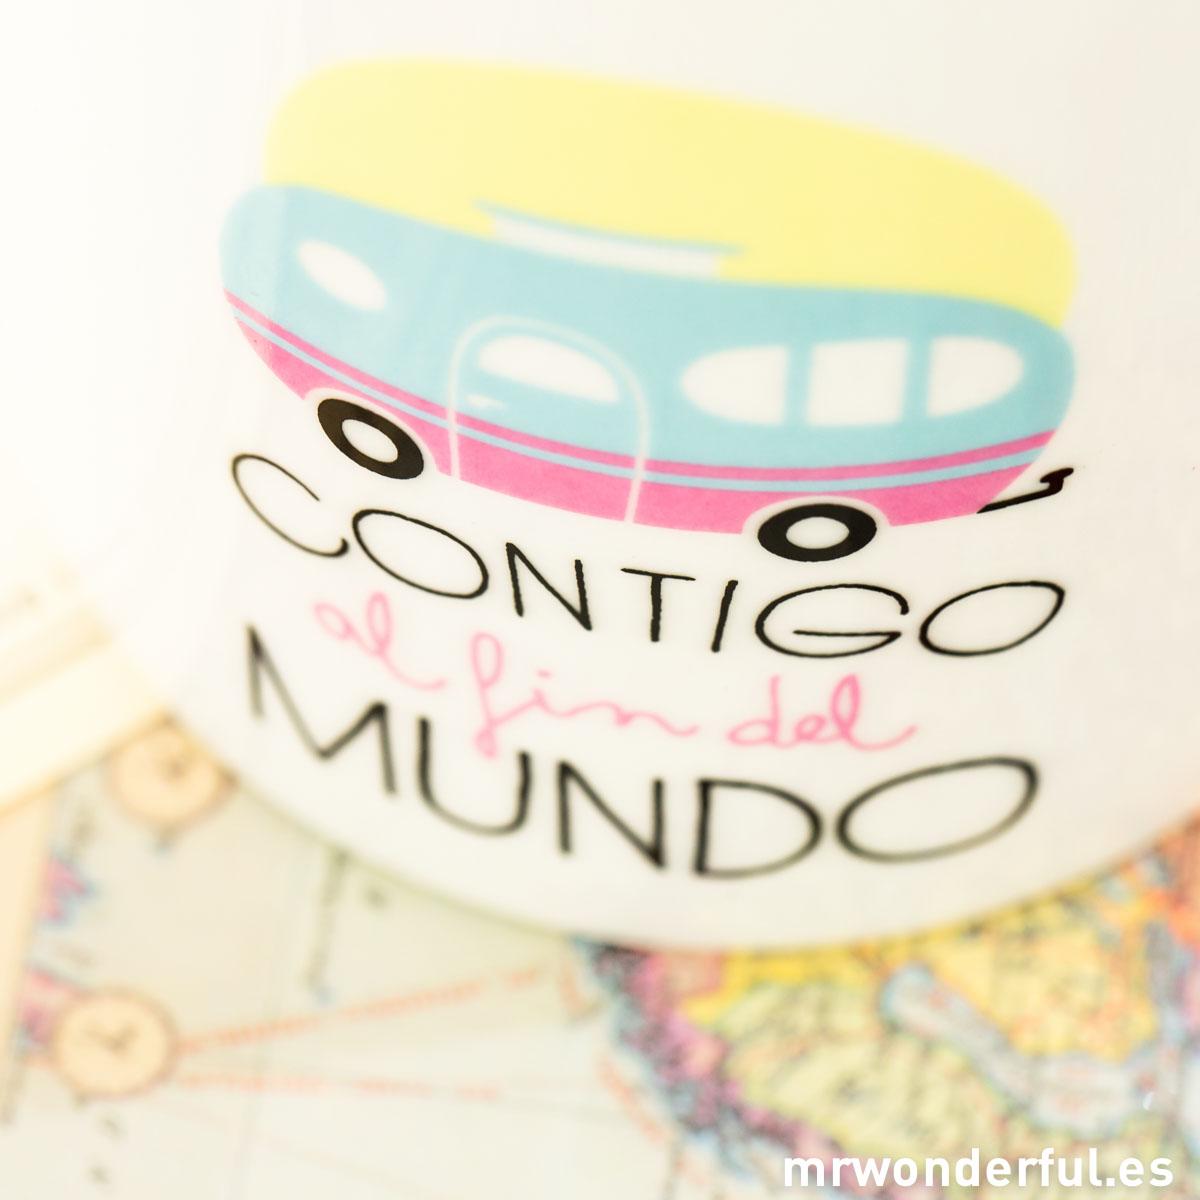 Mrwonderful_WON96_contigo-fin-mundo-30